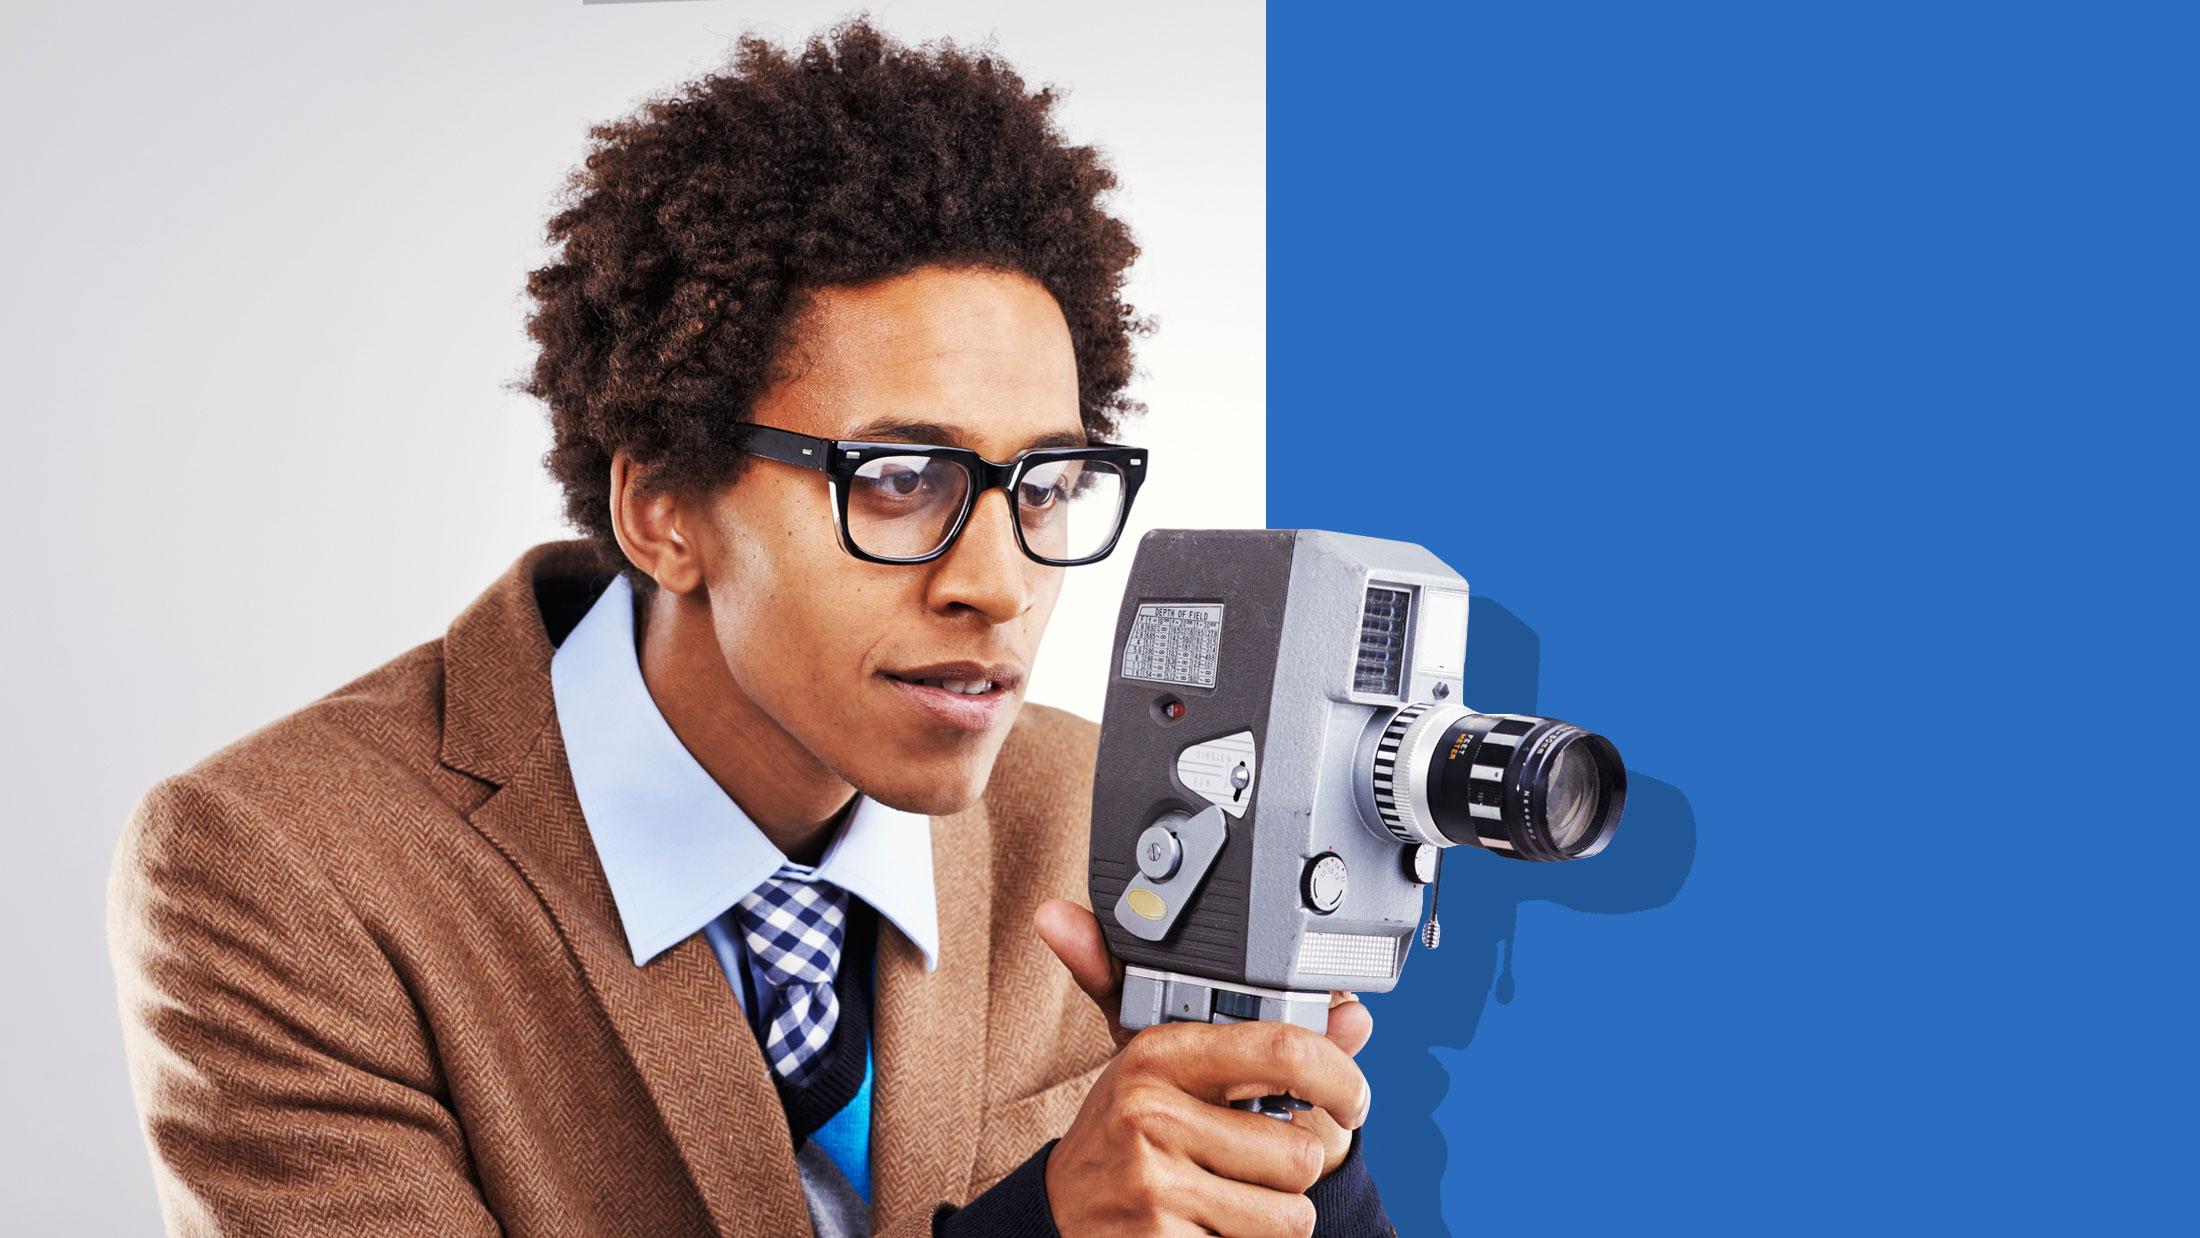 7 Video Content Marketing Strategies to Skyrocket Engagement: 2020 - BuzzSumo